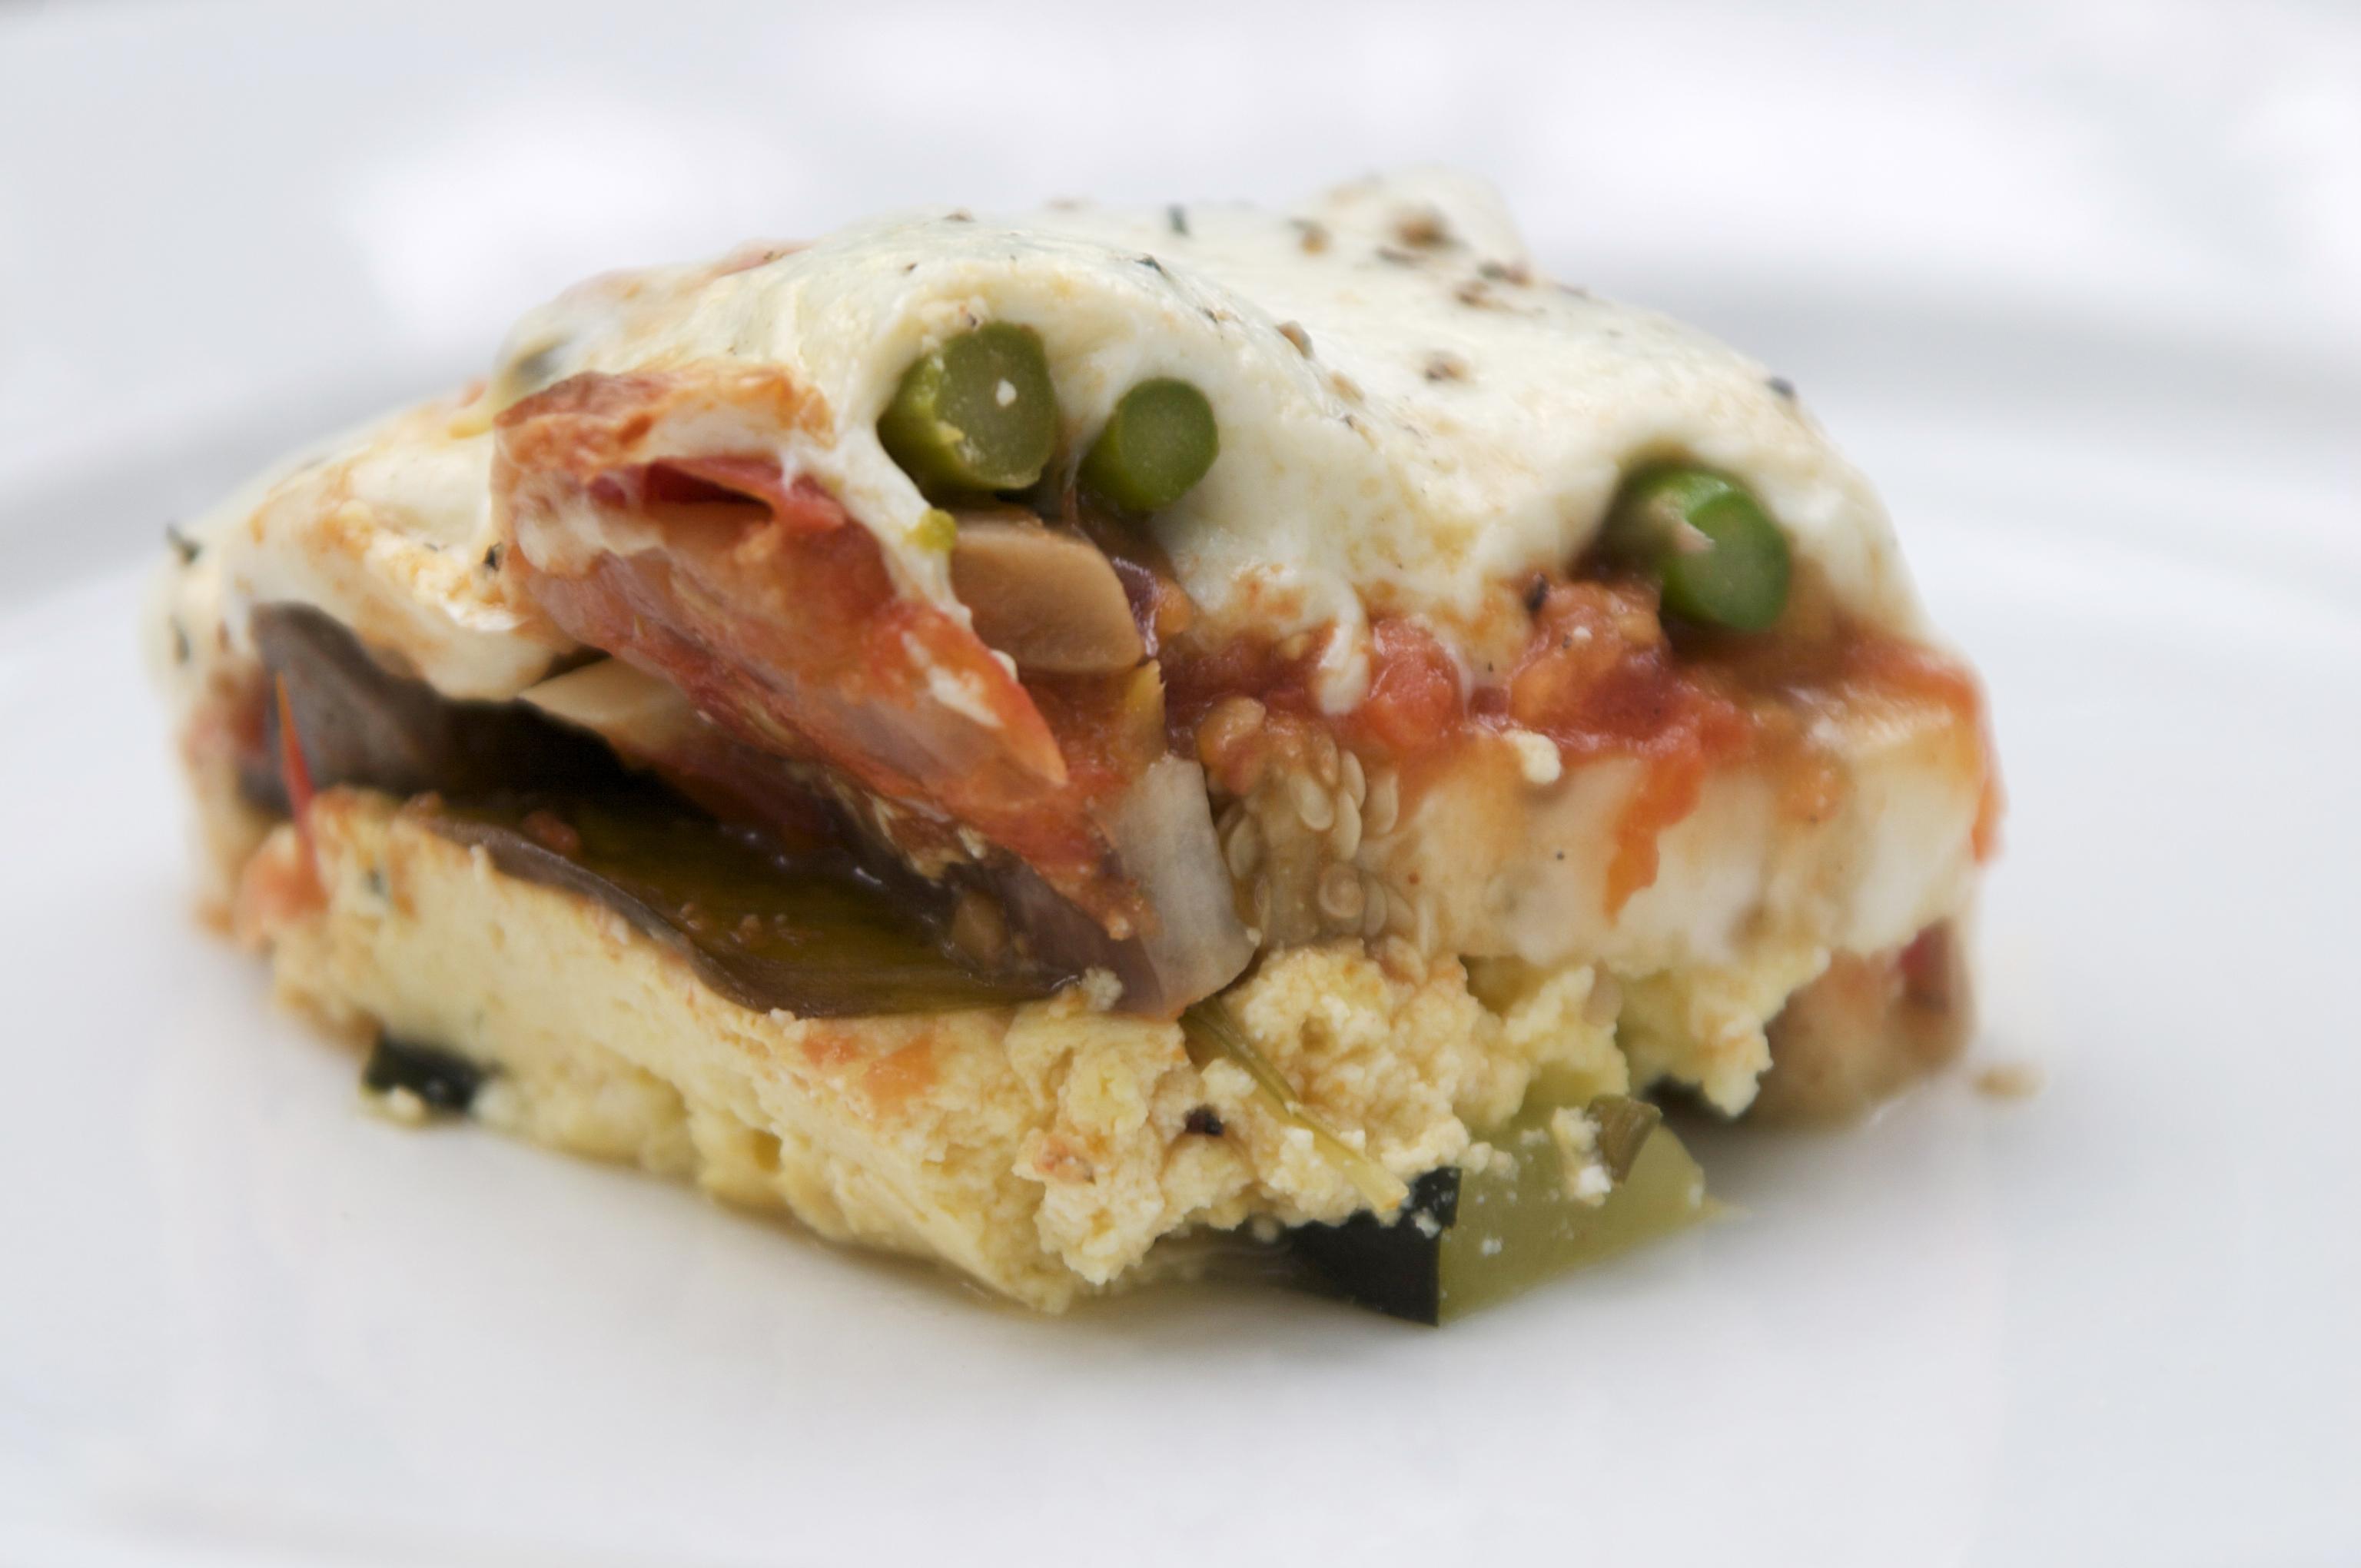 Pasta-less Summer Vegetable Lasagna